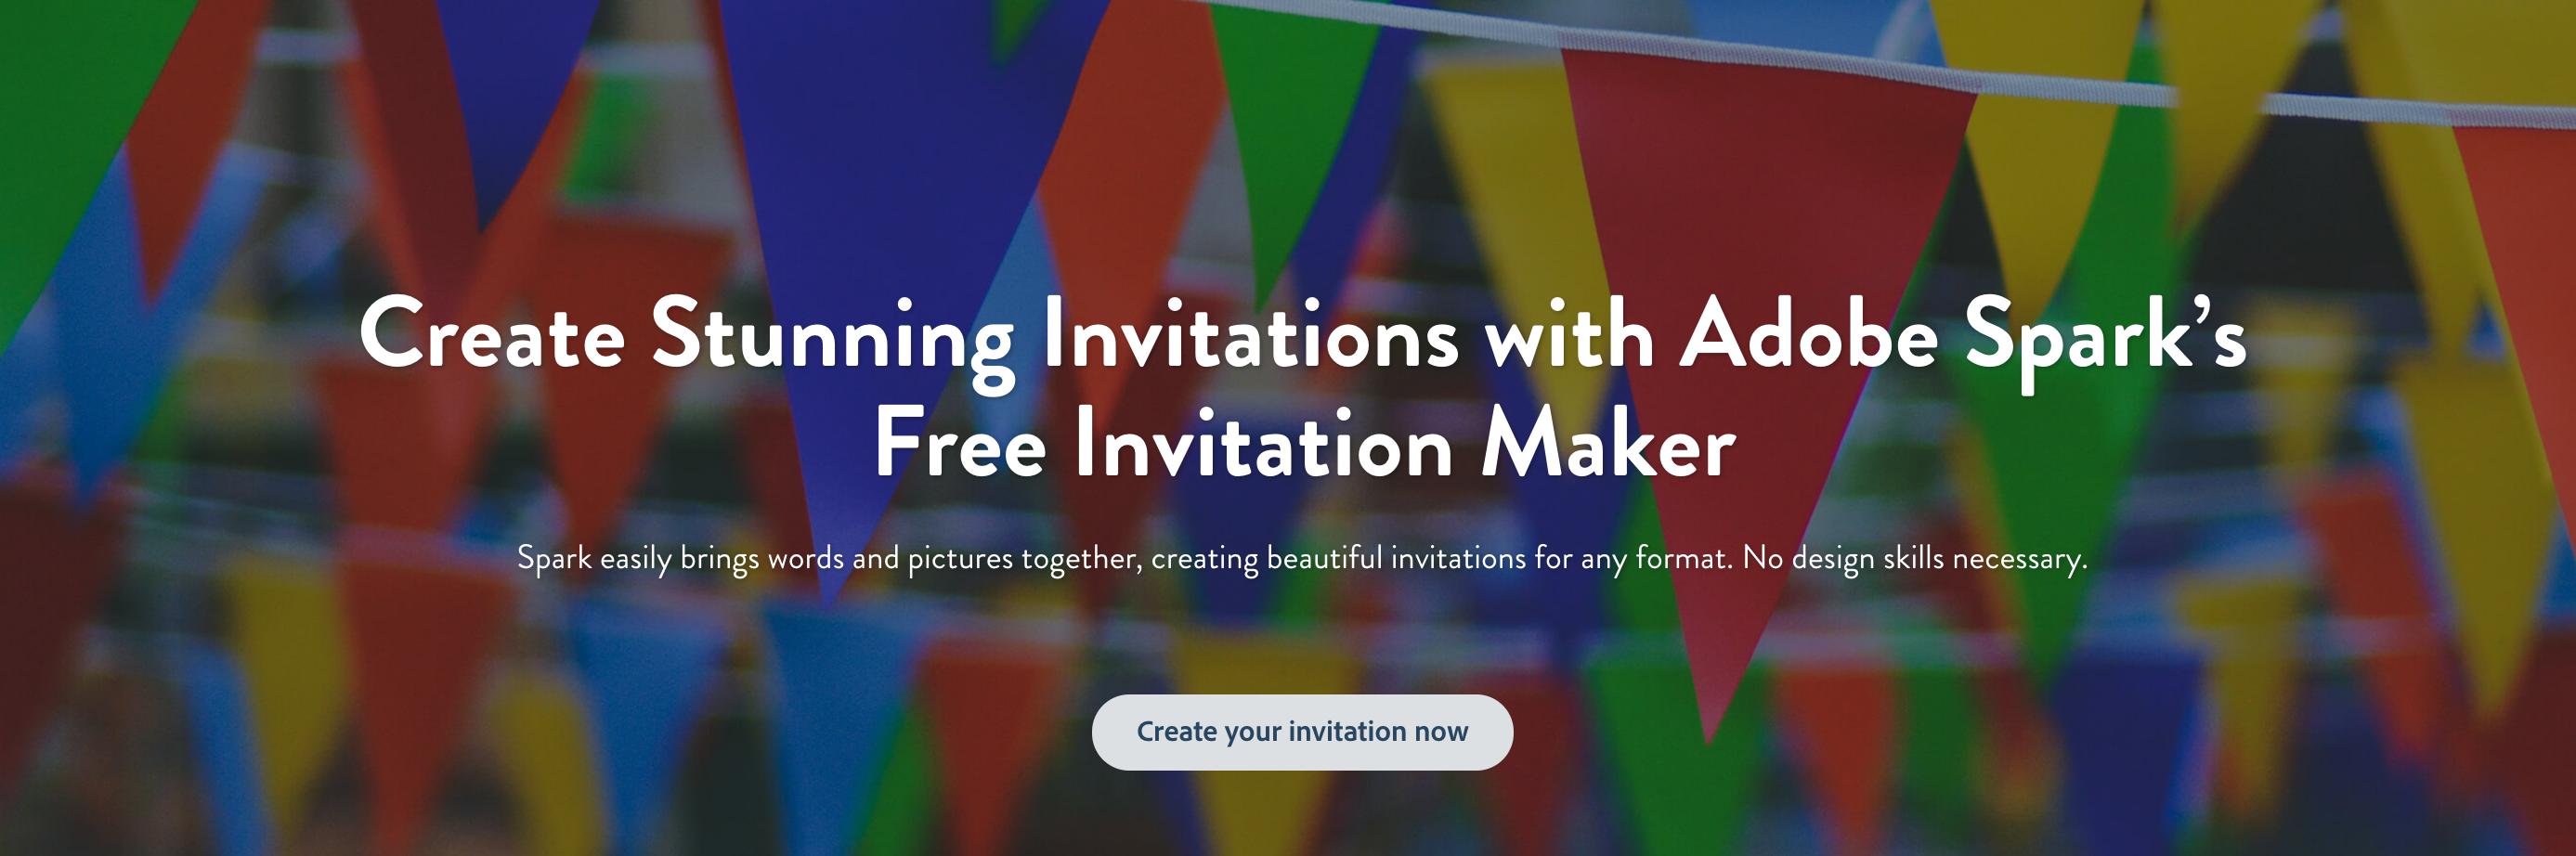 adobe spark's free online invitation maker helps you